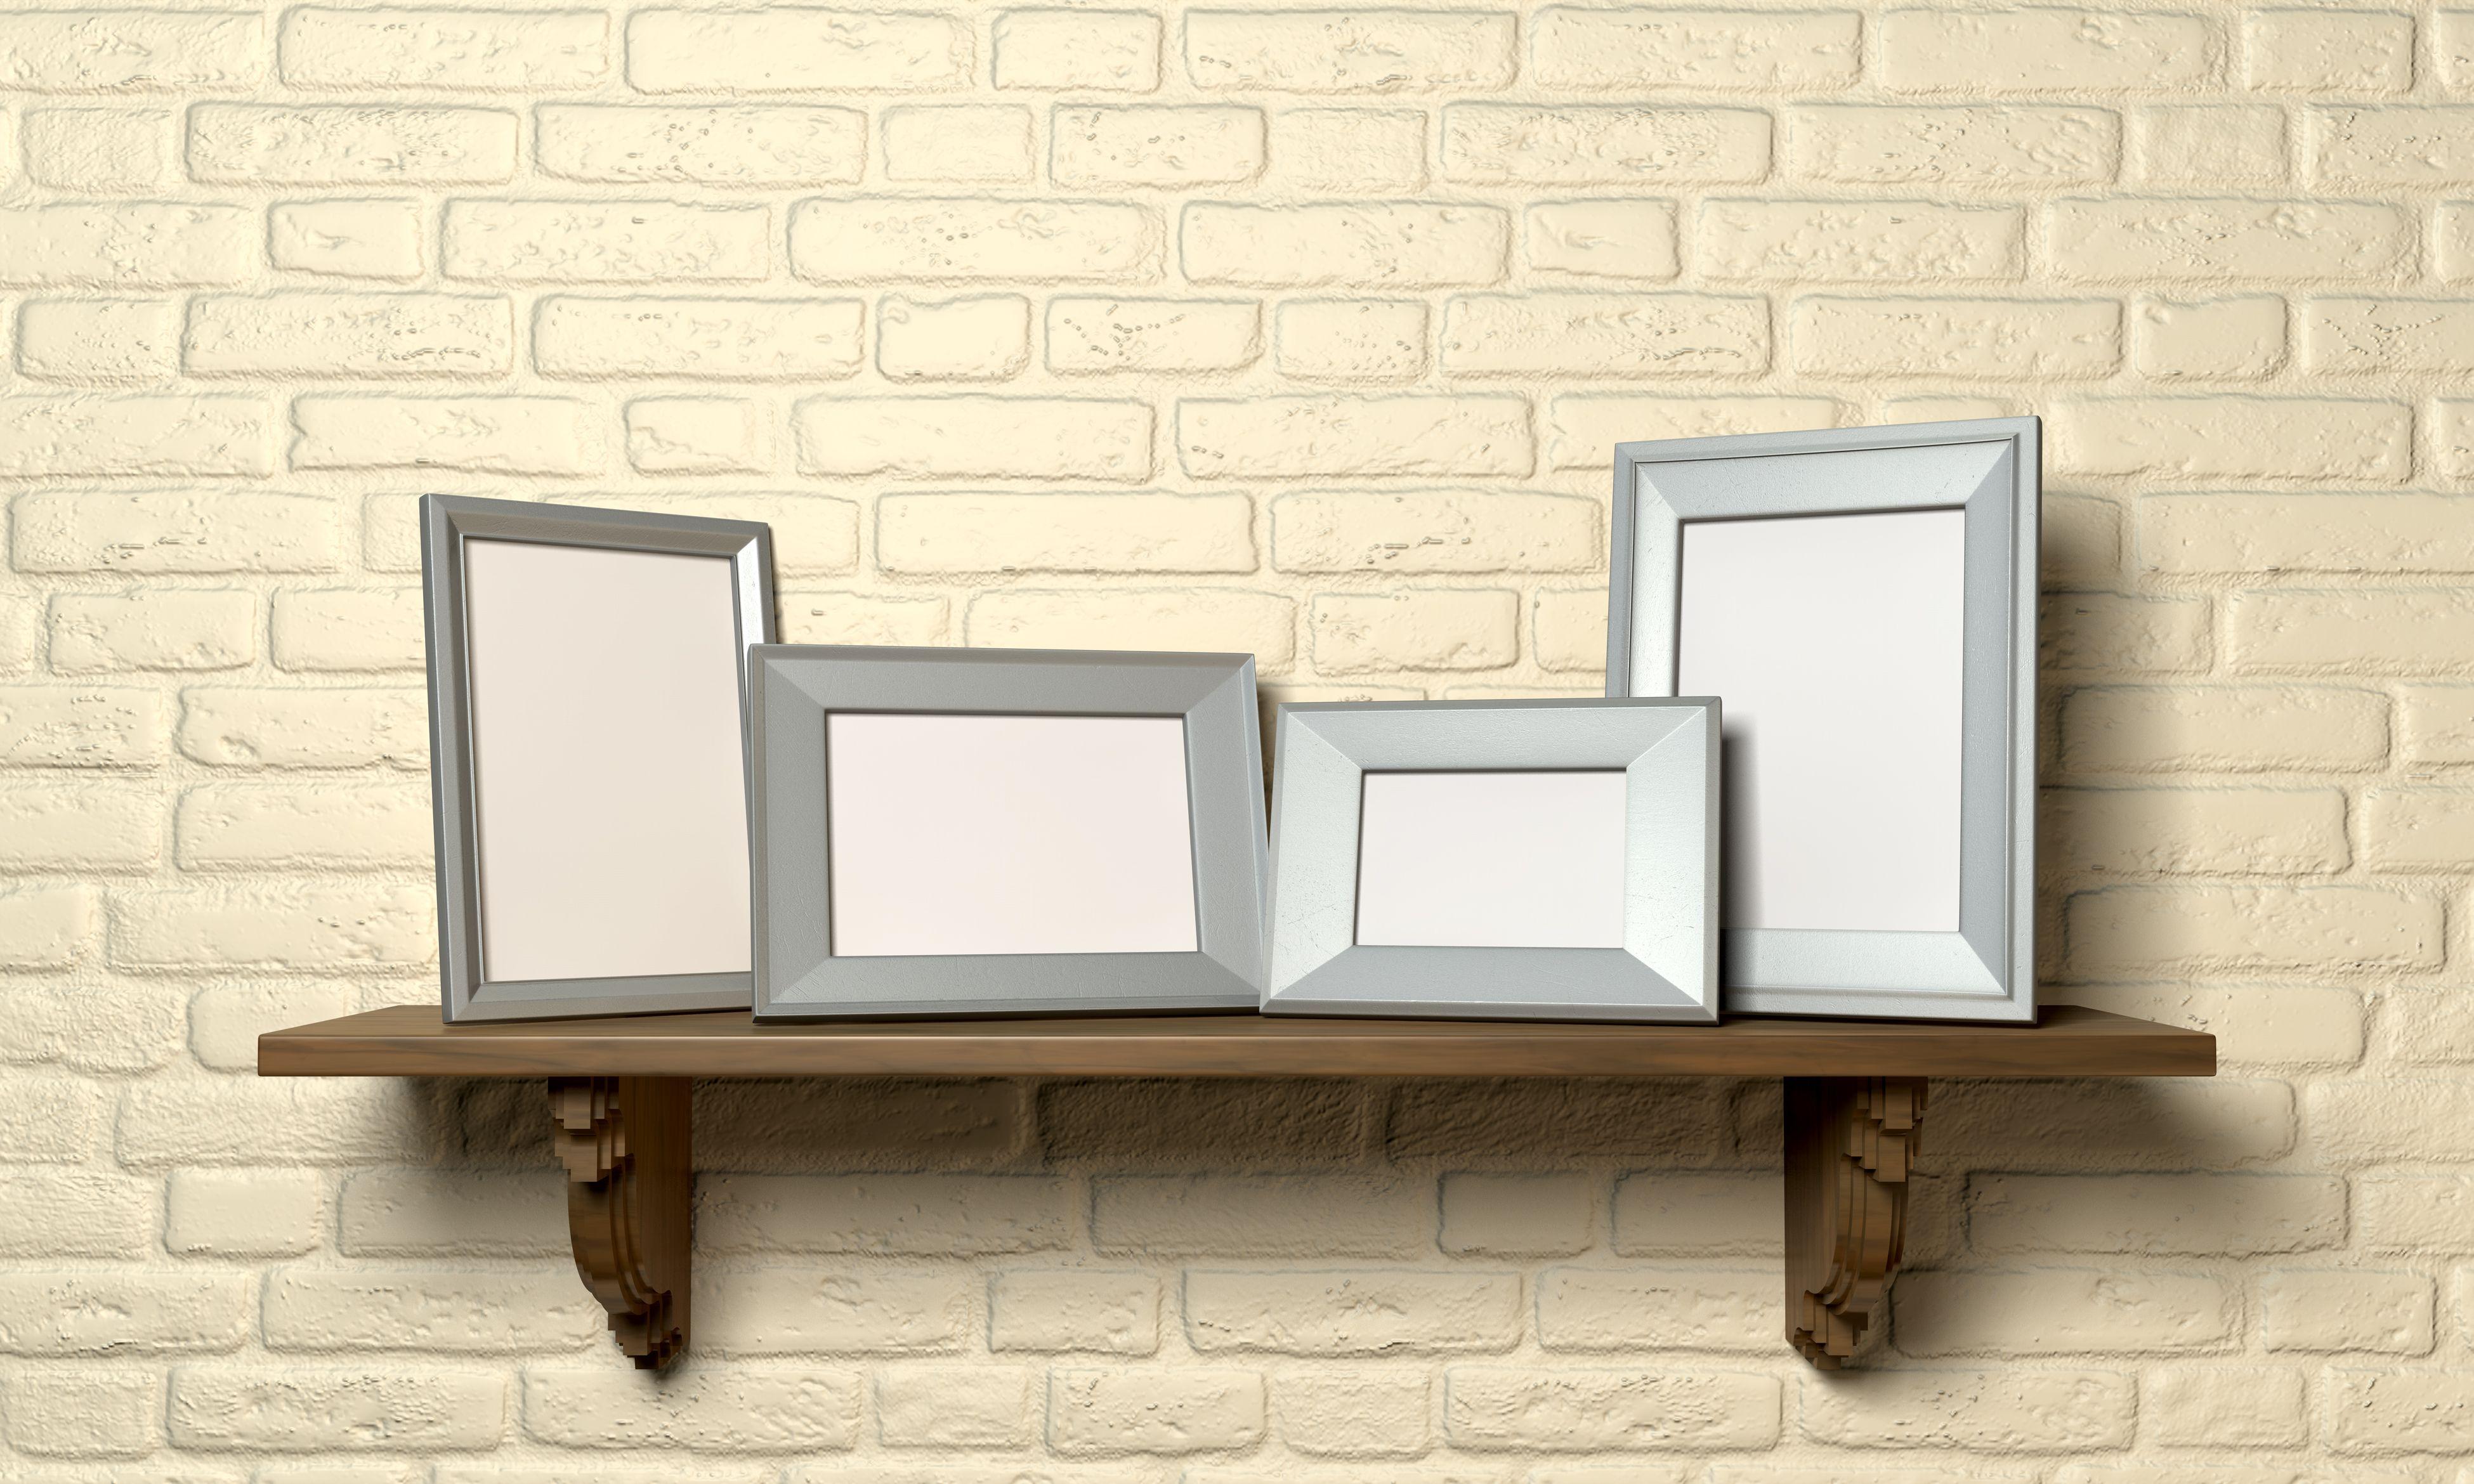 Photo frame ledge mounted on a wall.